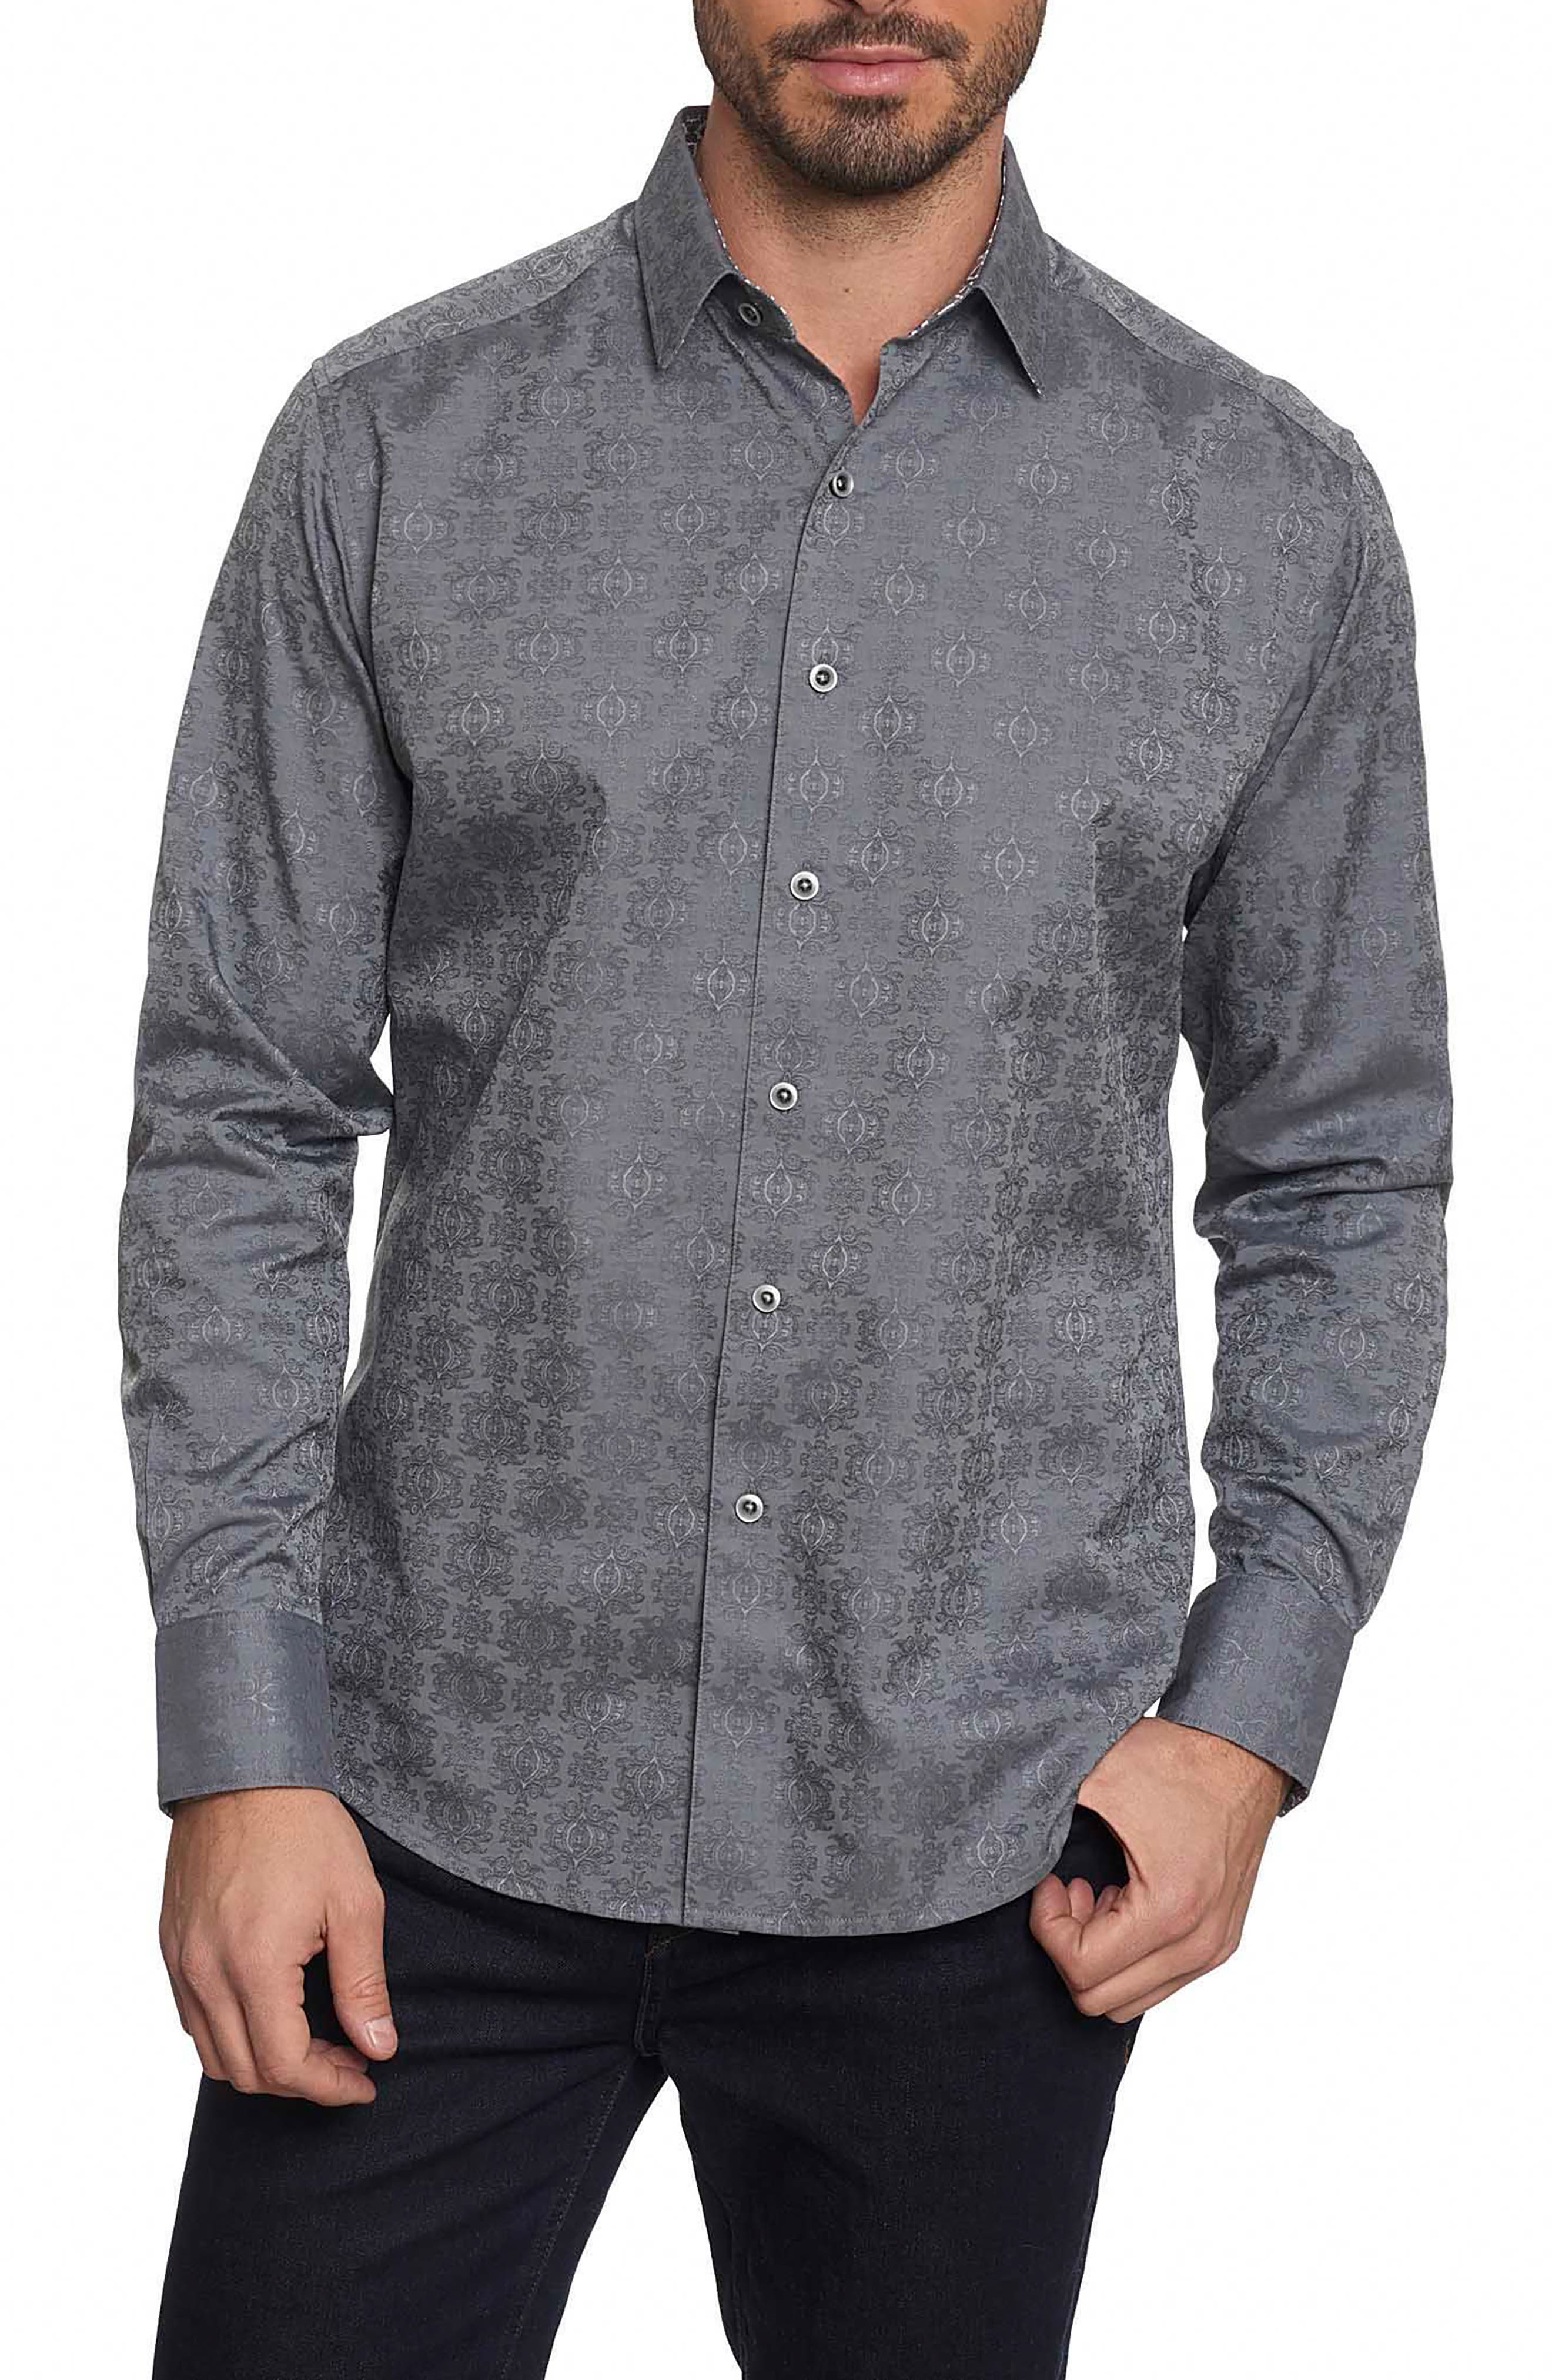 'Cullen' Classic Fit Jacquard Sport Shirt,                             Main thumbnail 1, color,                             020